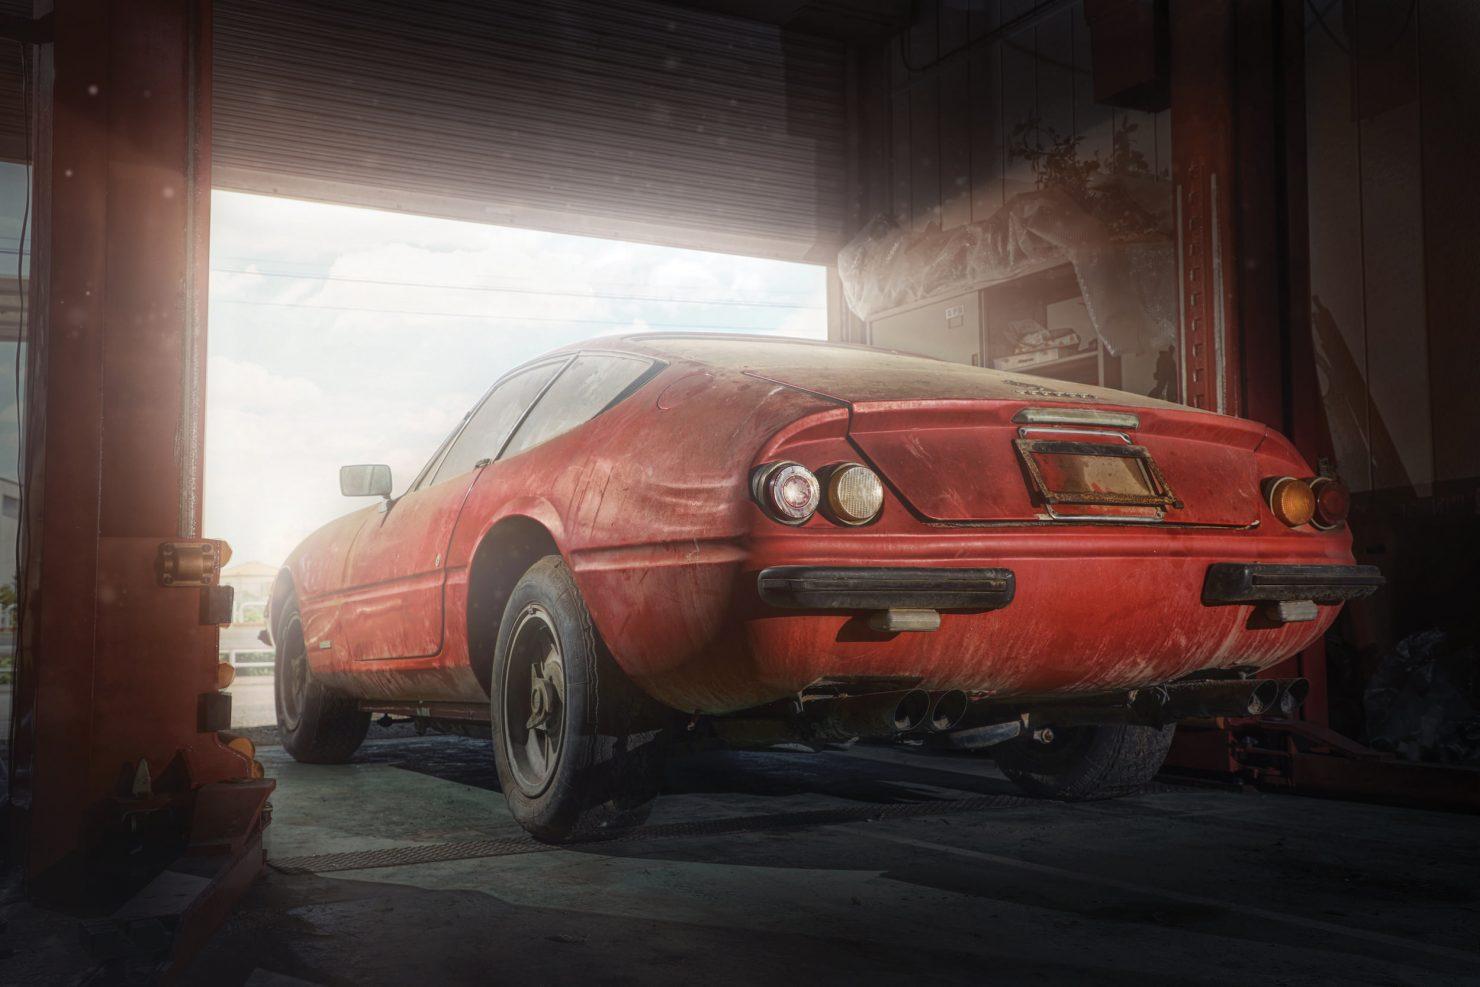 Ferrari 365 GTB4 Daytona Alloy 15 1480x987 - Barn Find: 1969 Ferrari 365 GTB/4 Daytona Alloy